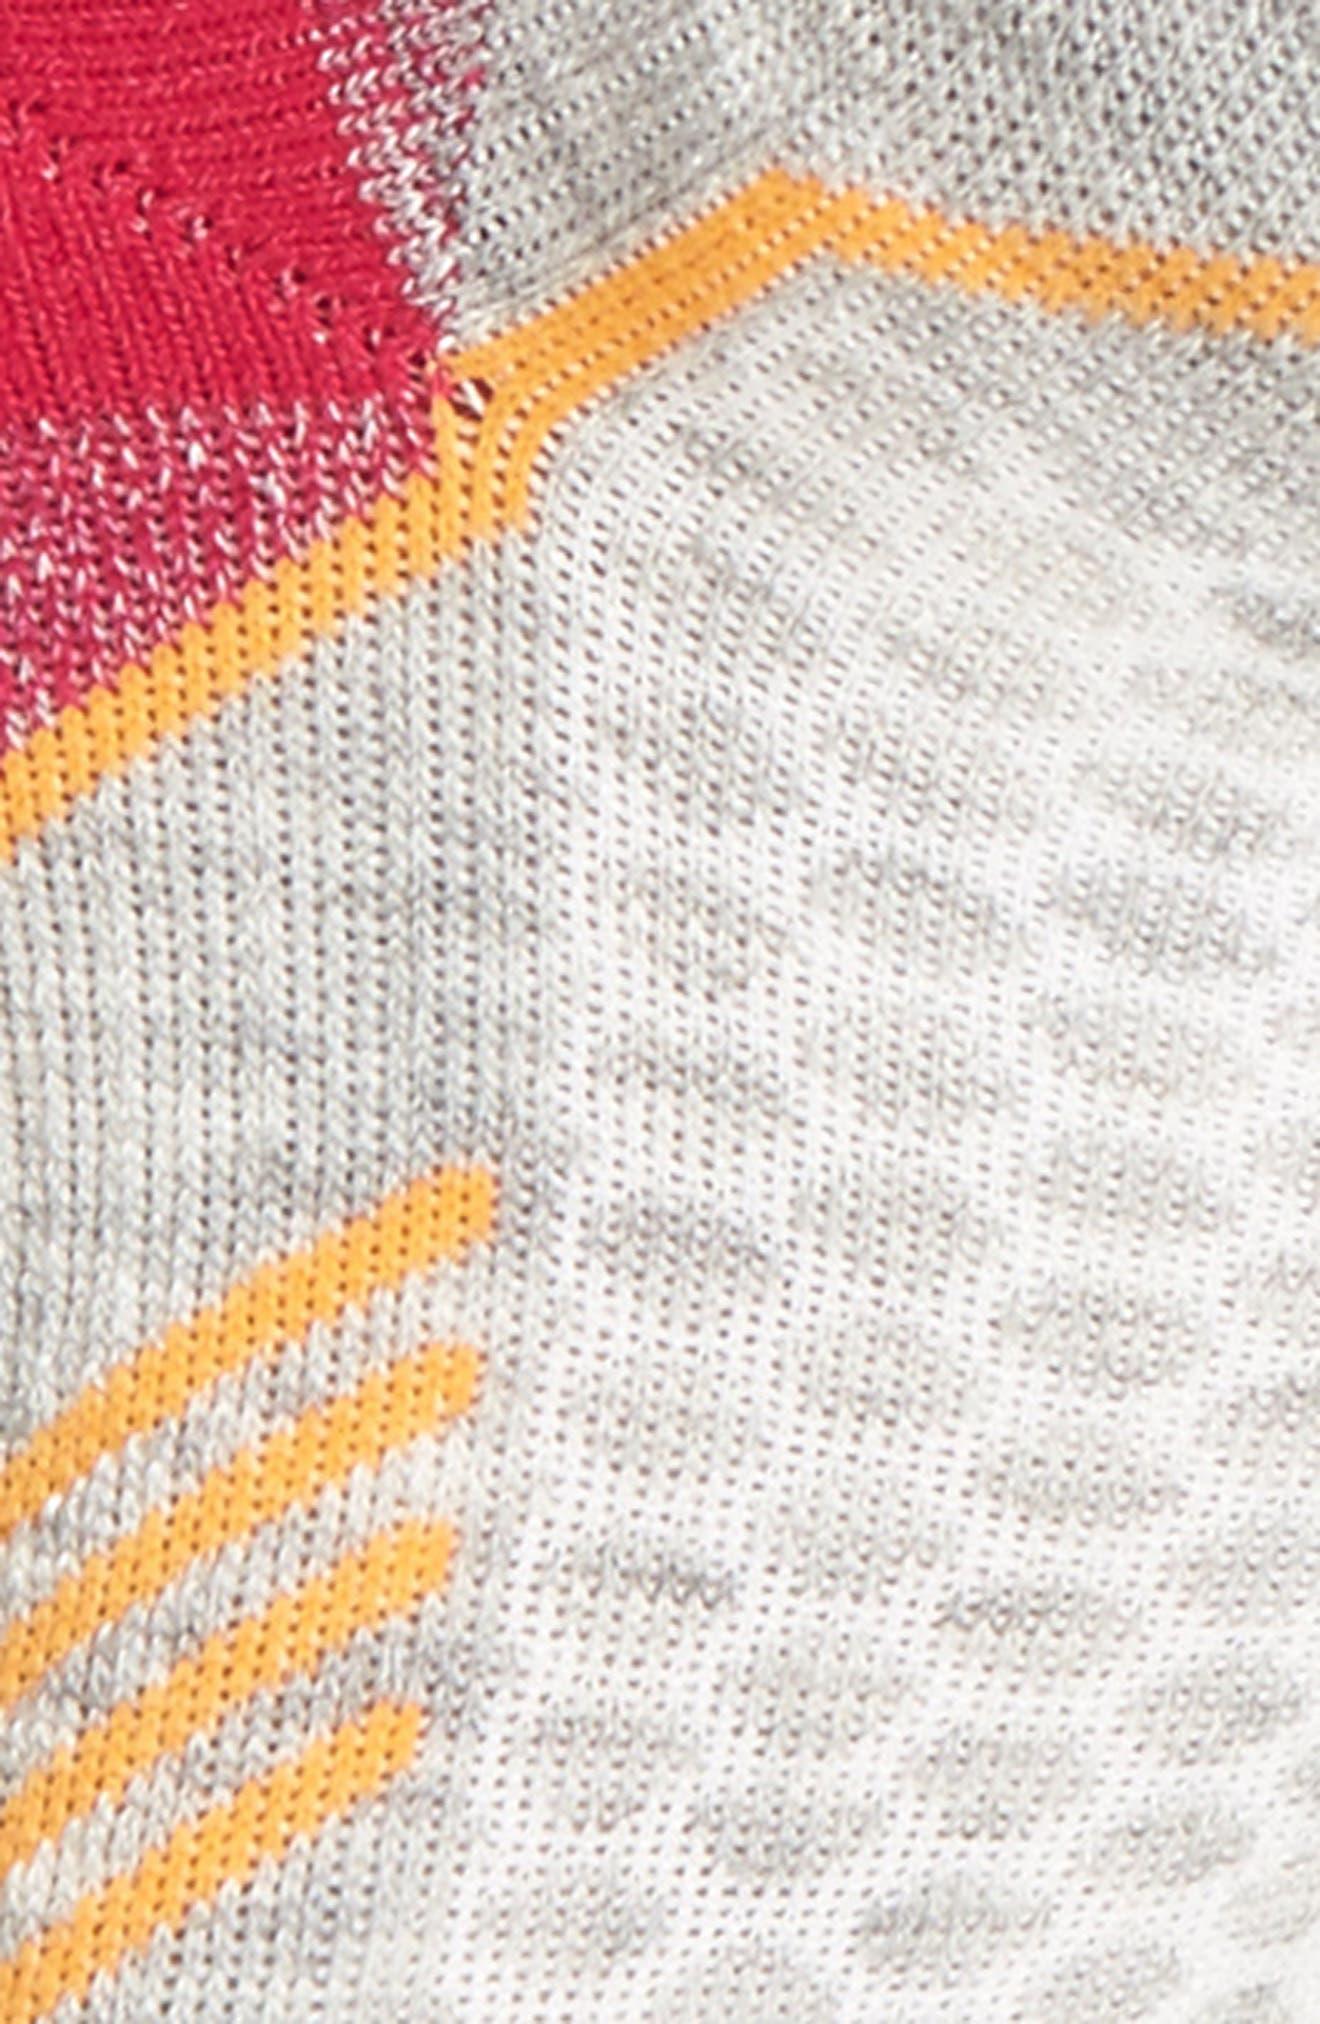 Incline Micro Compression Socks,                             Alternate thumbnail 2, color,                             020